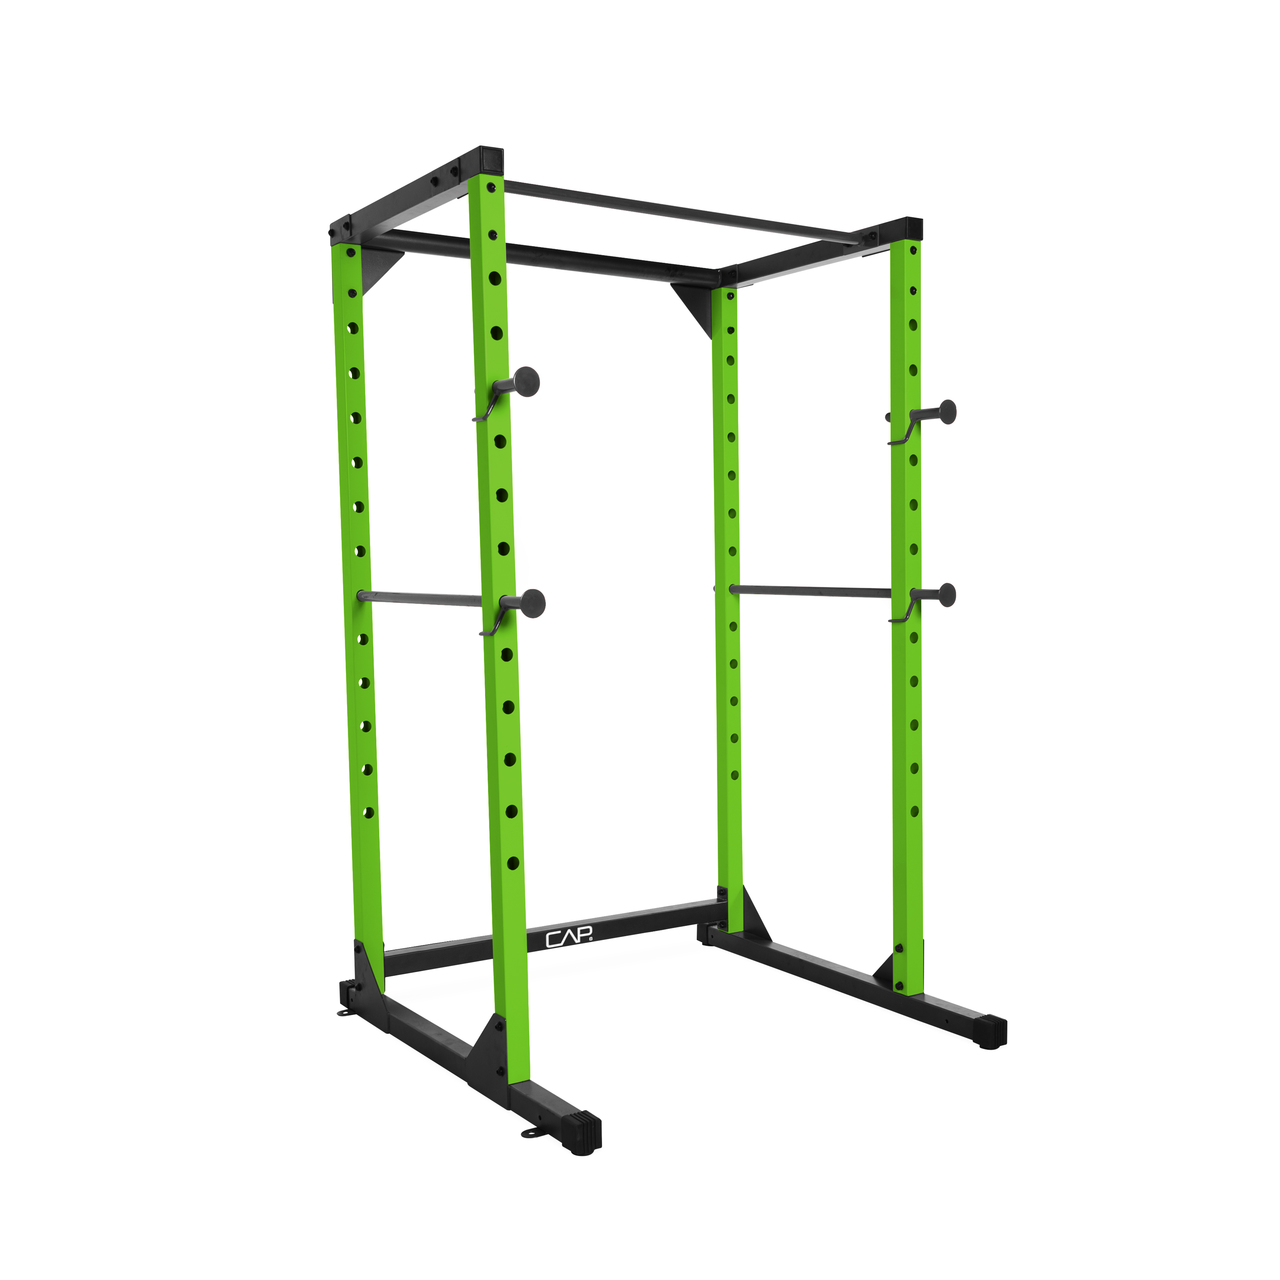 cap barbell 6 foot full cage power rack